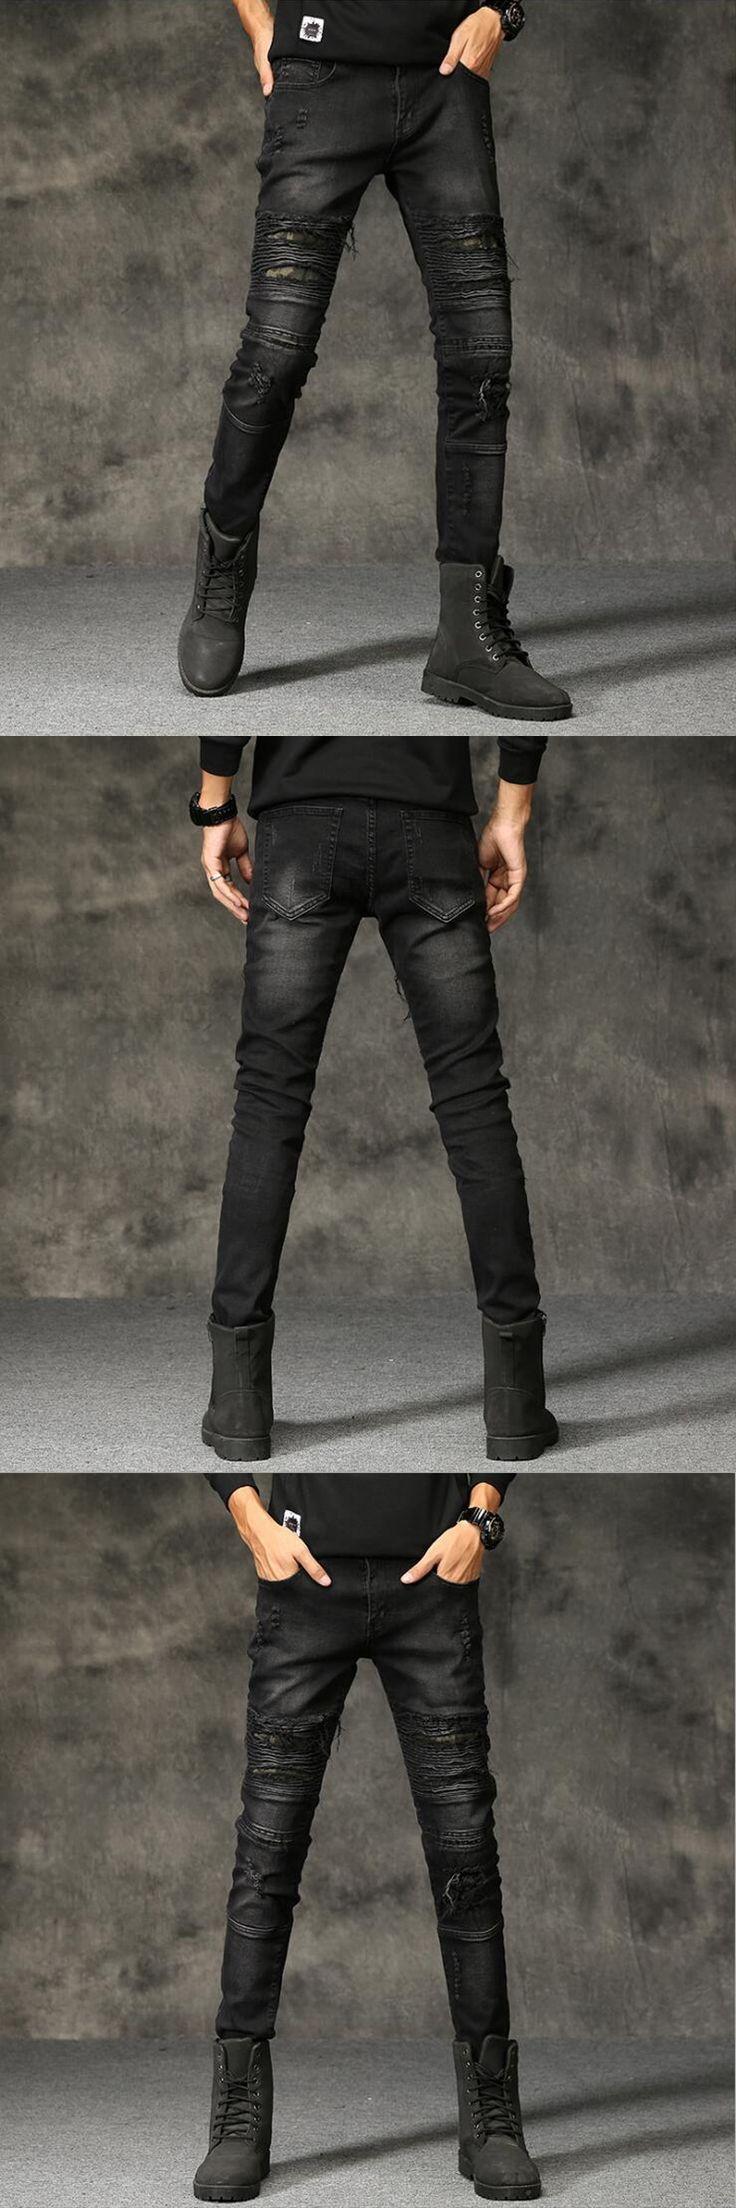 Waterwashed Denim Overalls Men Balplein Brand Moto Biker Jeans Uomo Punk Style Slim Fit Men`s Black Ripped Knee Jeans Homme E205